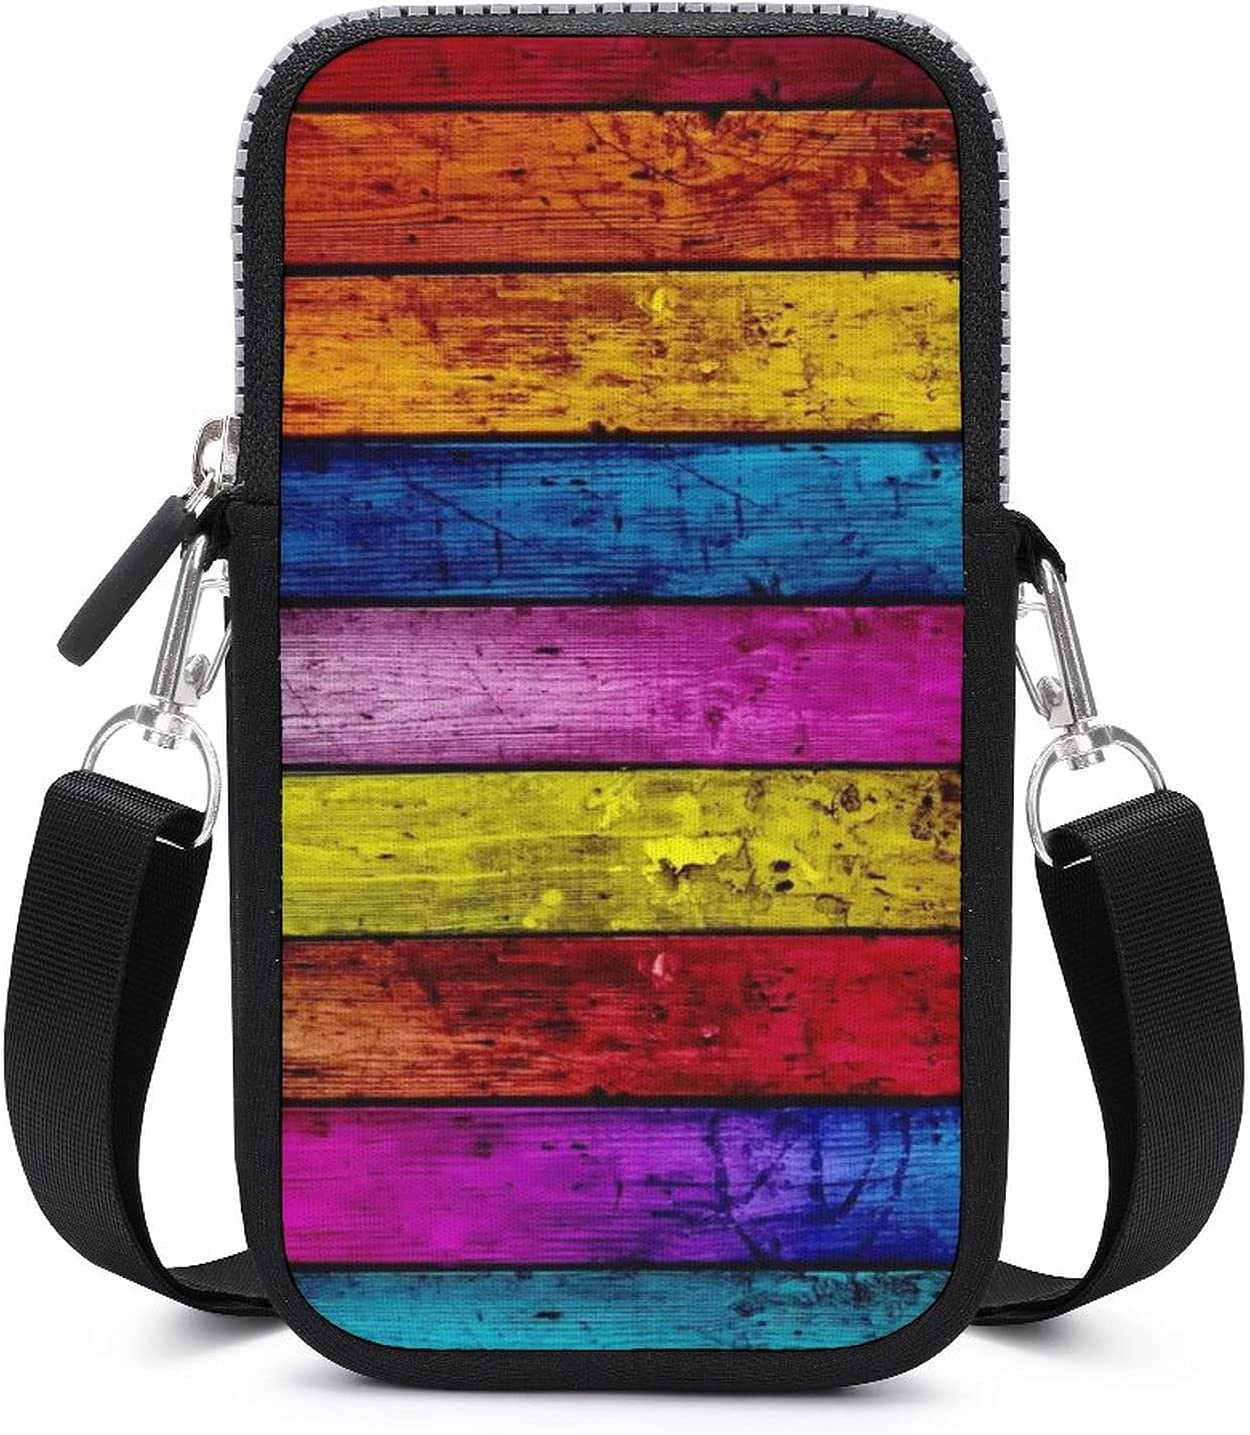 SWEET TANG Vintage Colorful Wood Phone Riding Multipurpose Handbag - Passport, Credit Card Adjustable Shoulder Strap, Holder Wristlet Convertible Cross Body Bag